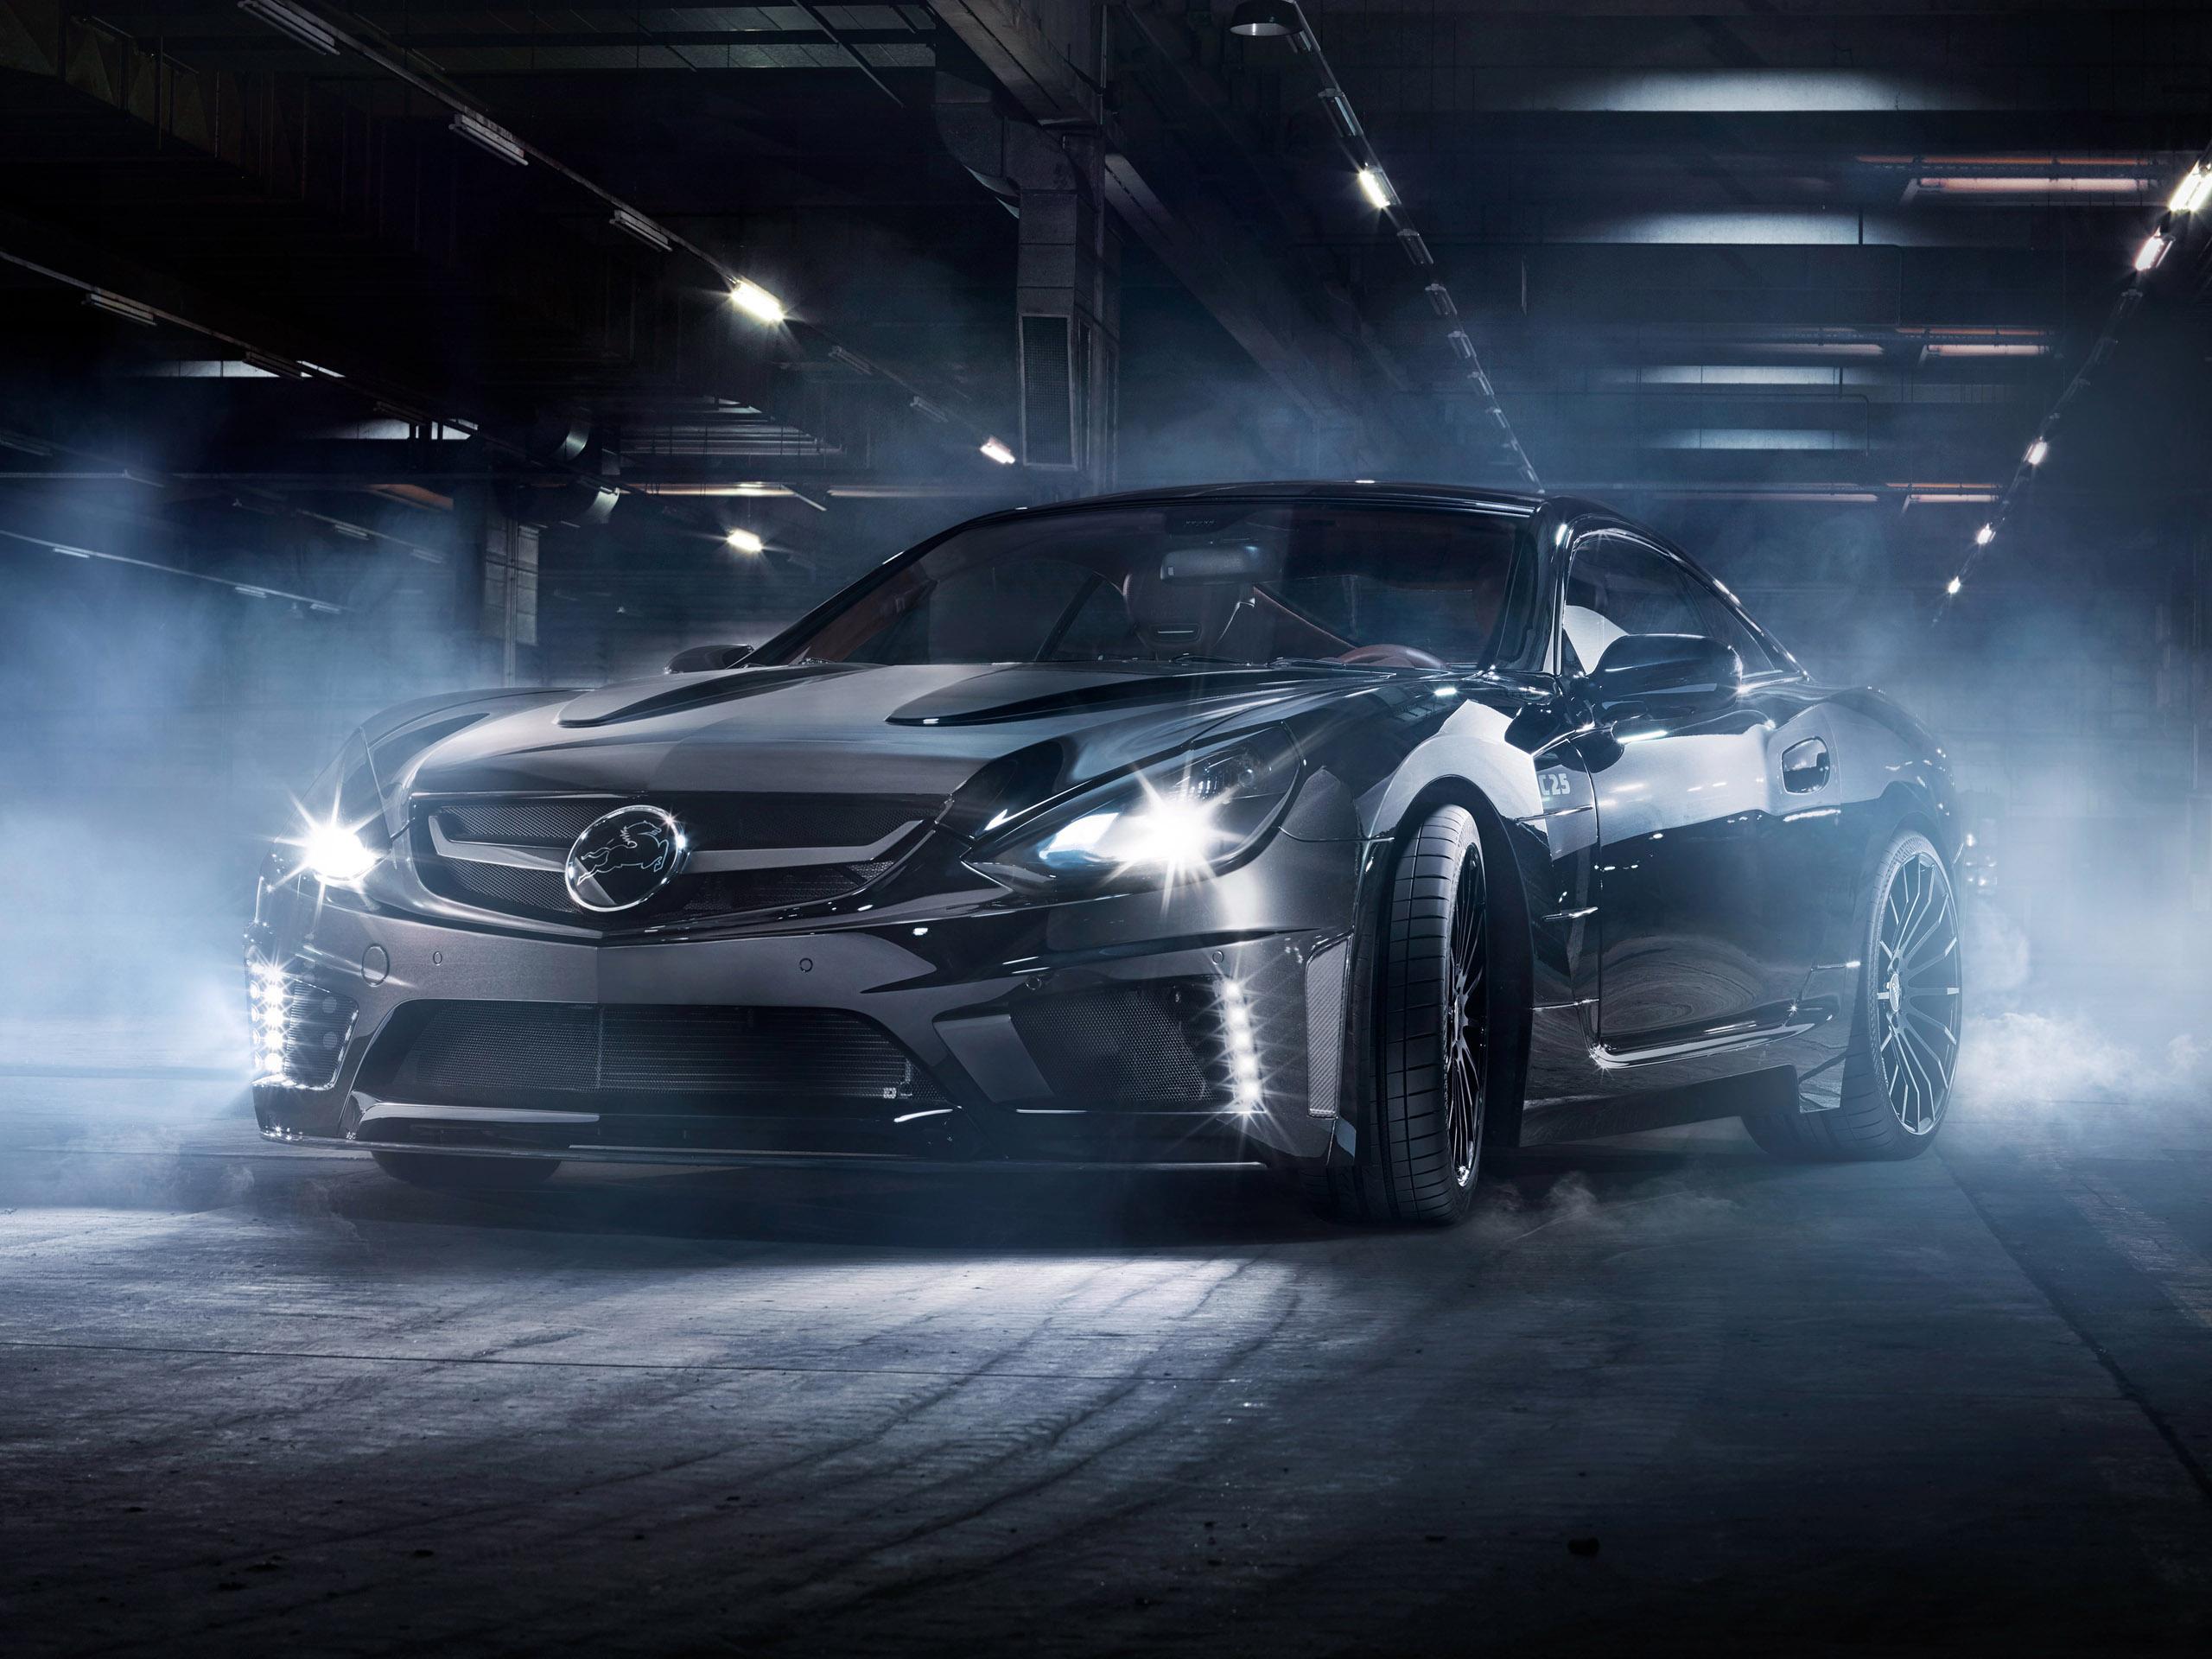 2015 Carlsson C25 Super GT Final Edition R230 base du Mercedes-Benz SL